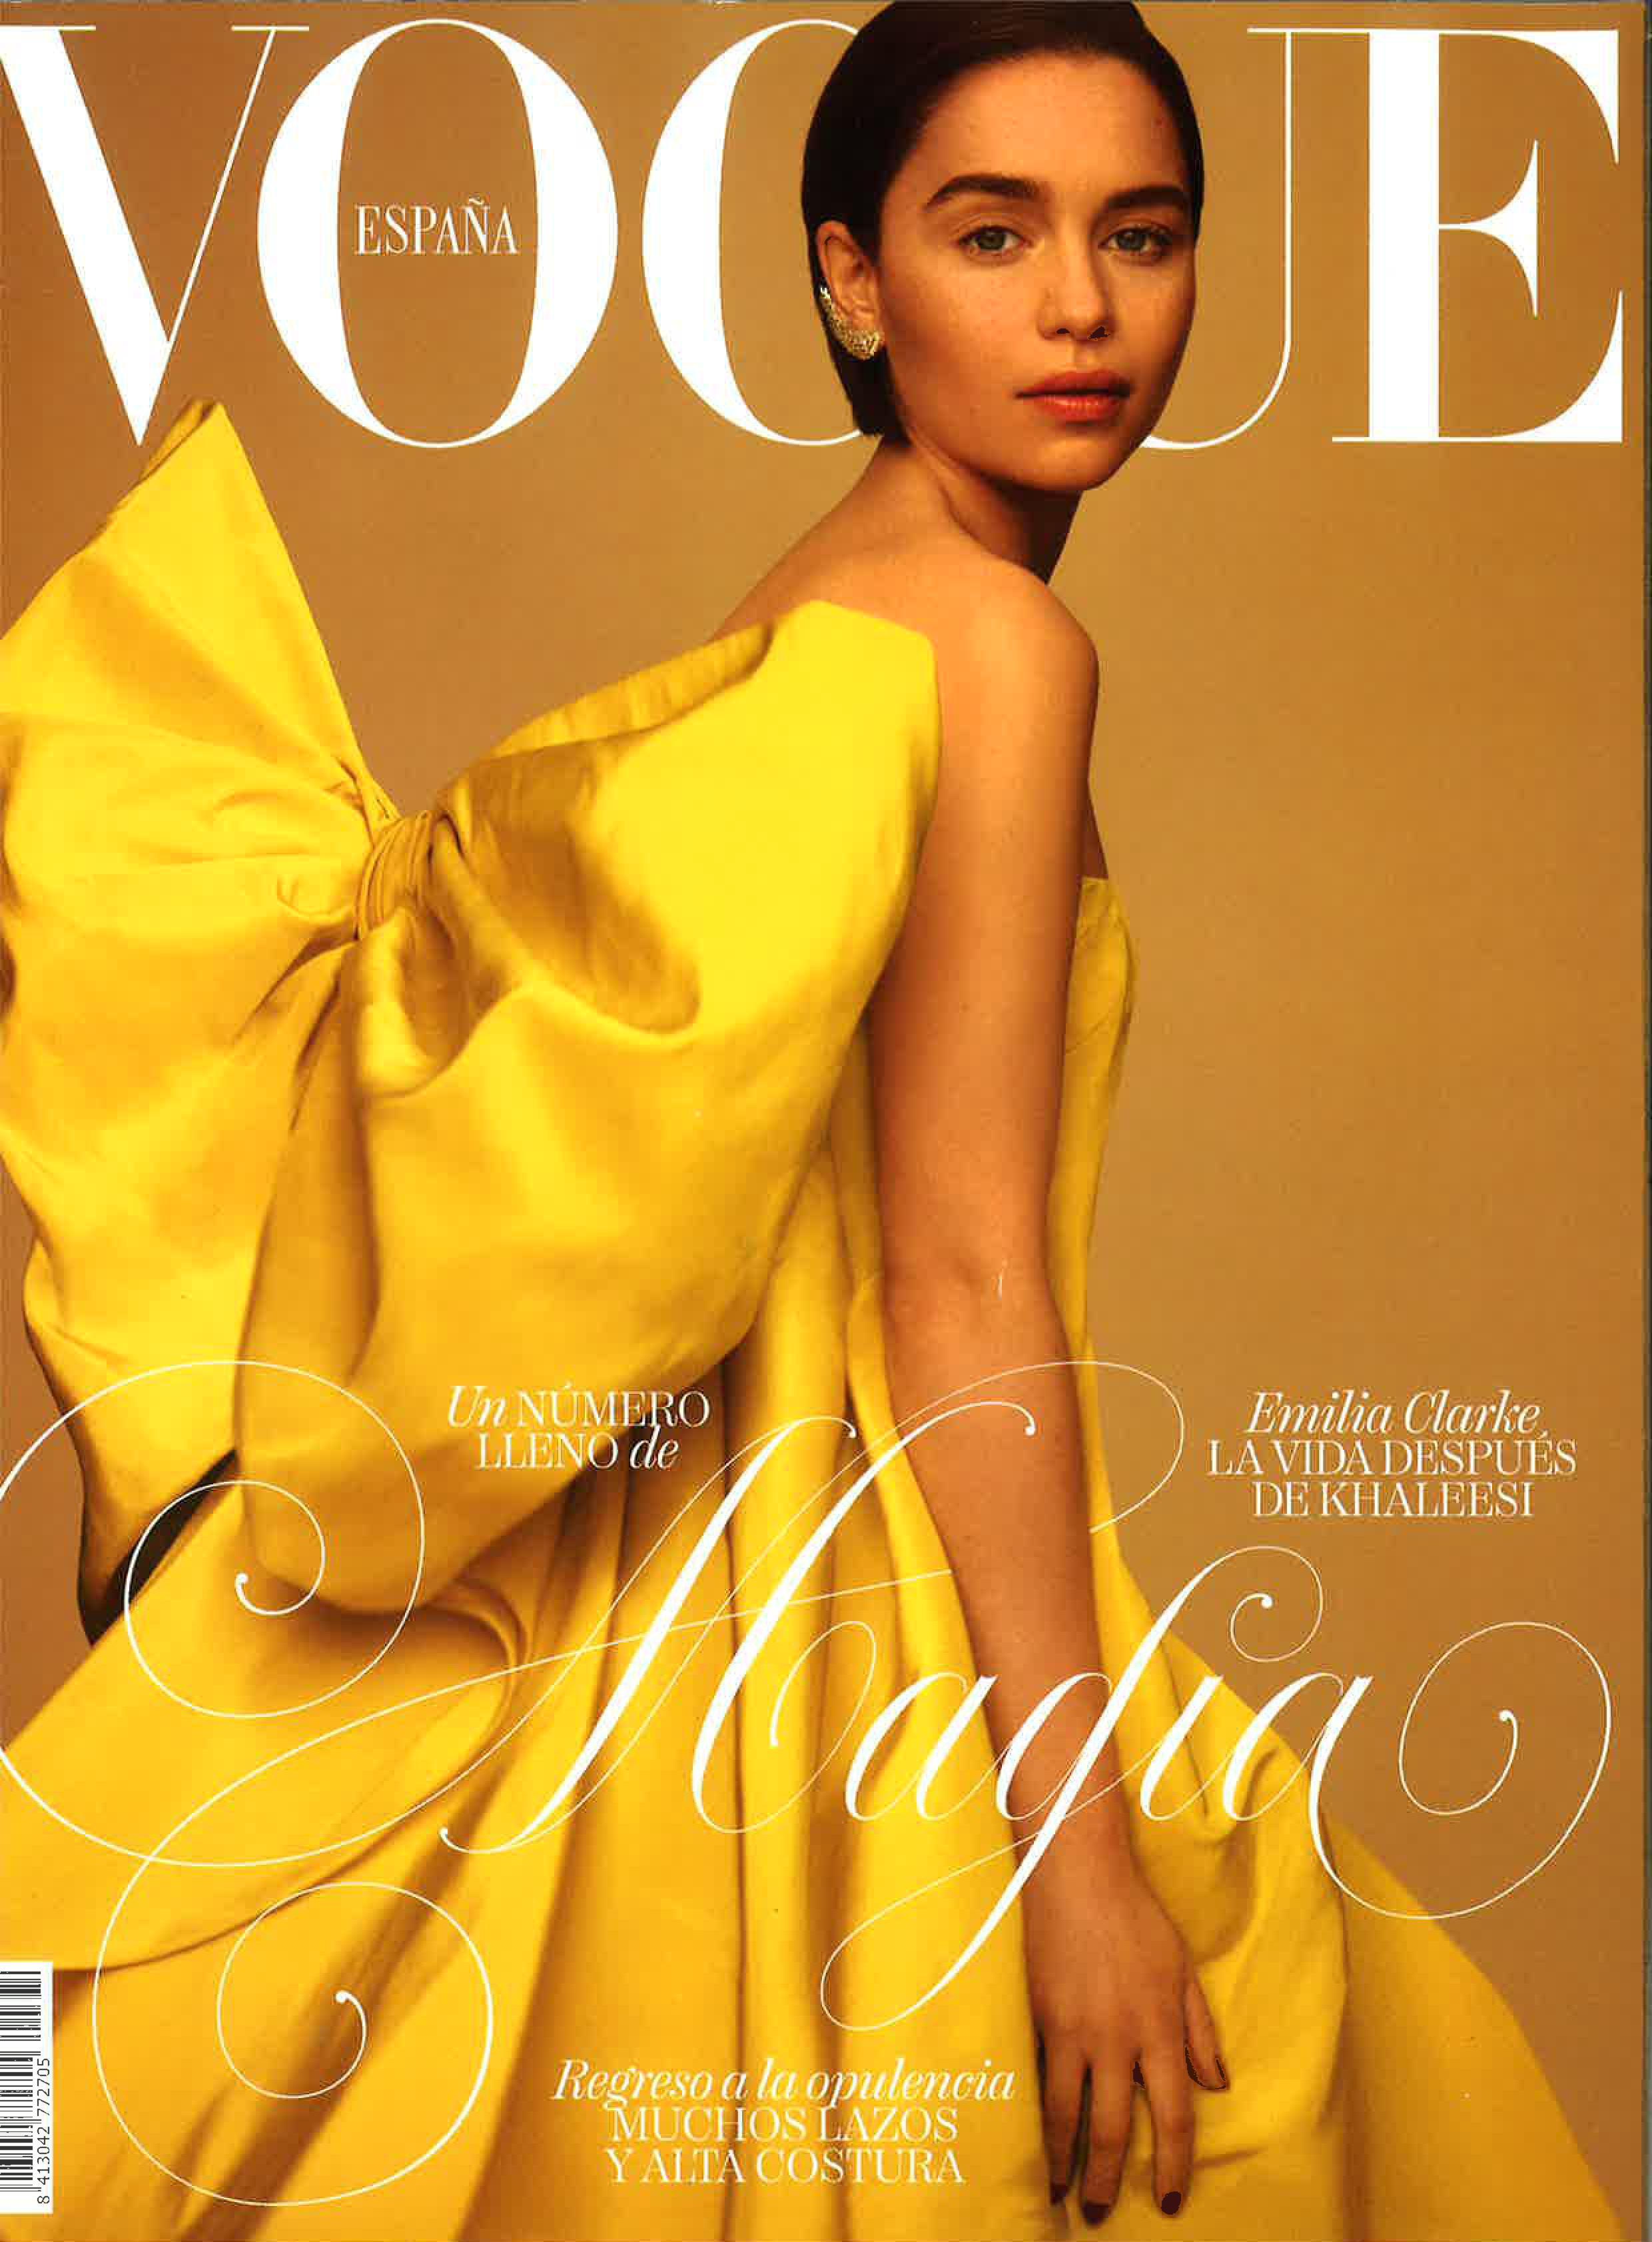 Vogue_ES_May_2019_COVER